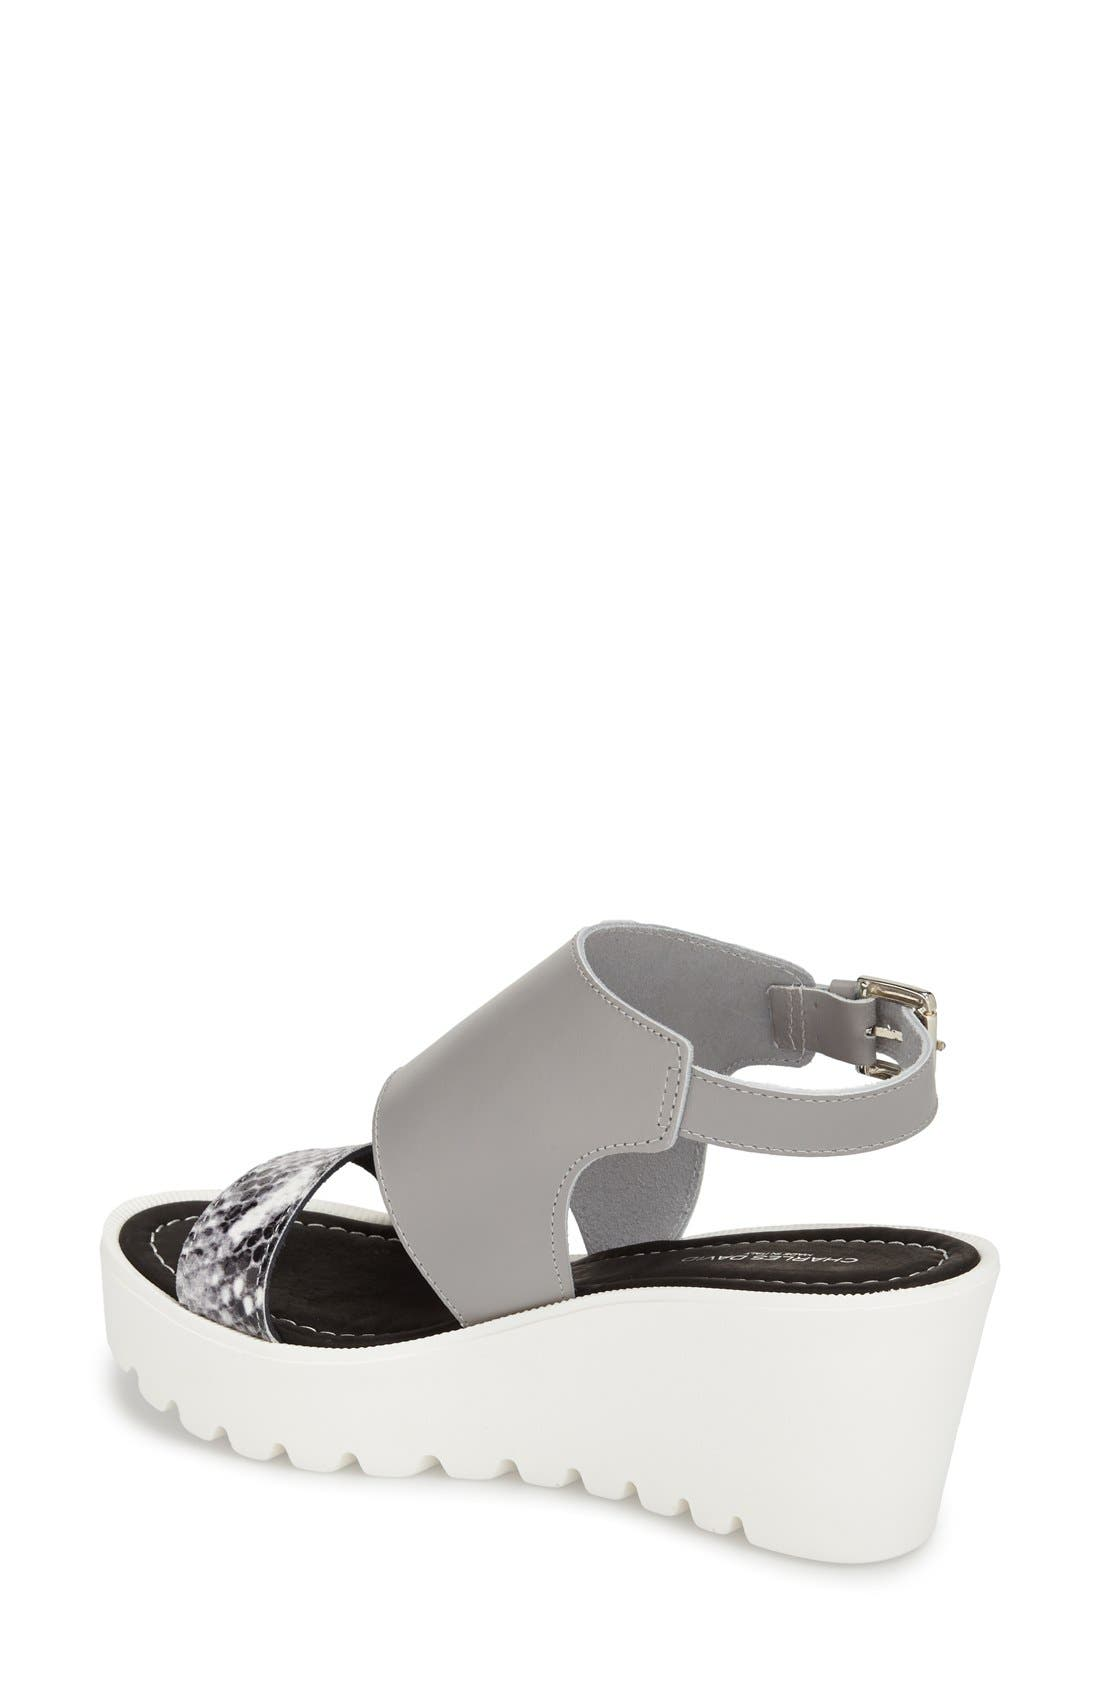 Alternate Image 2  - Charles David 'Apria' Wedge Sandal (Women)